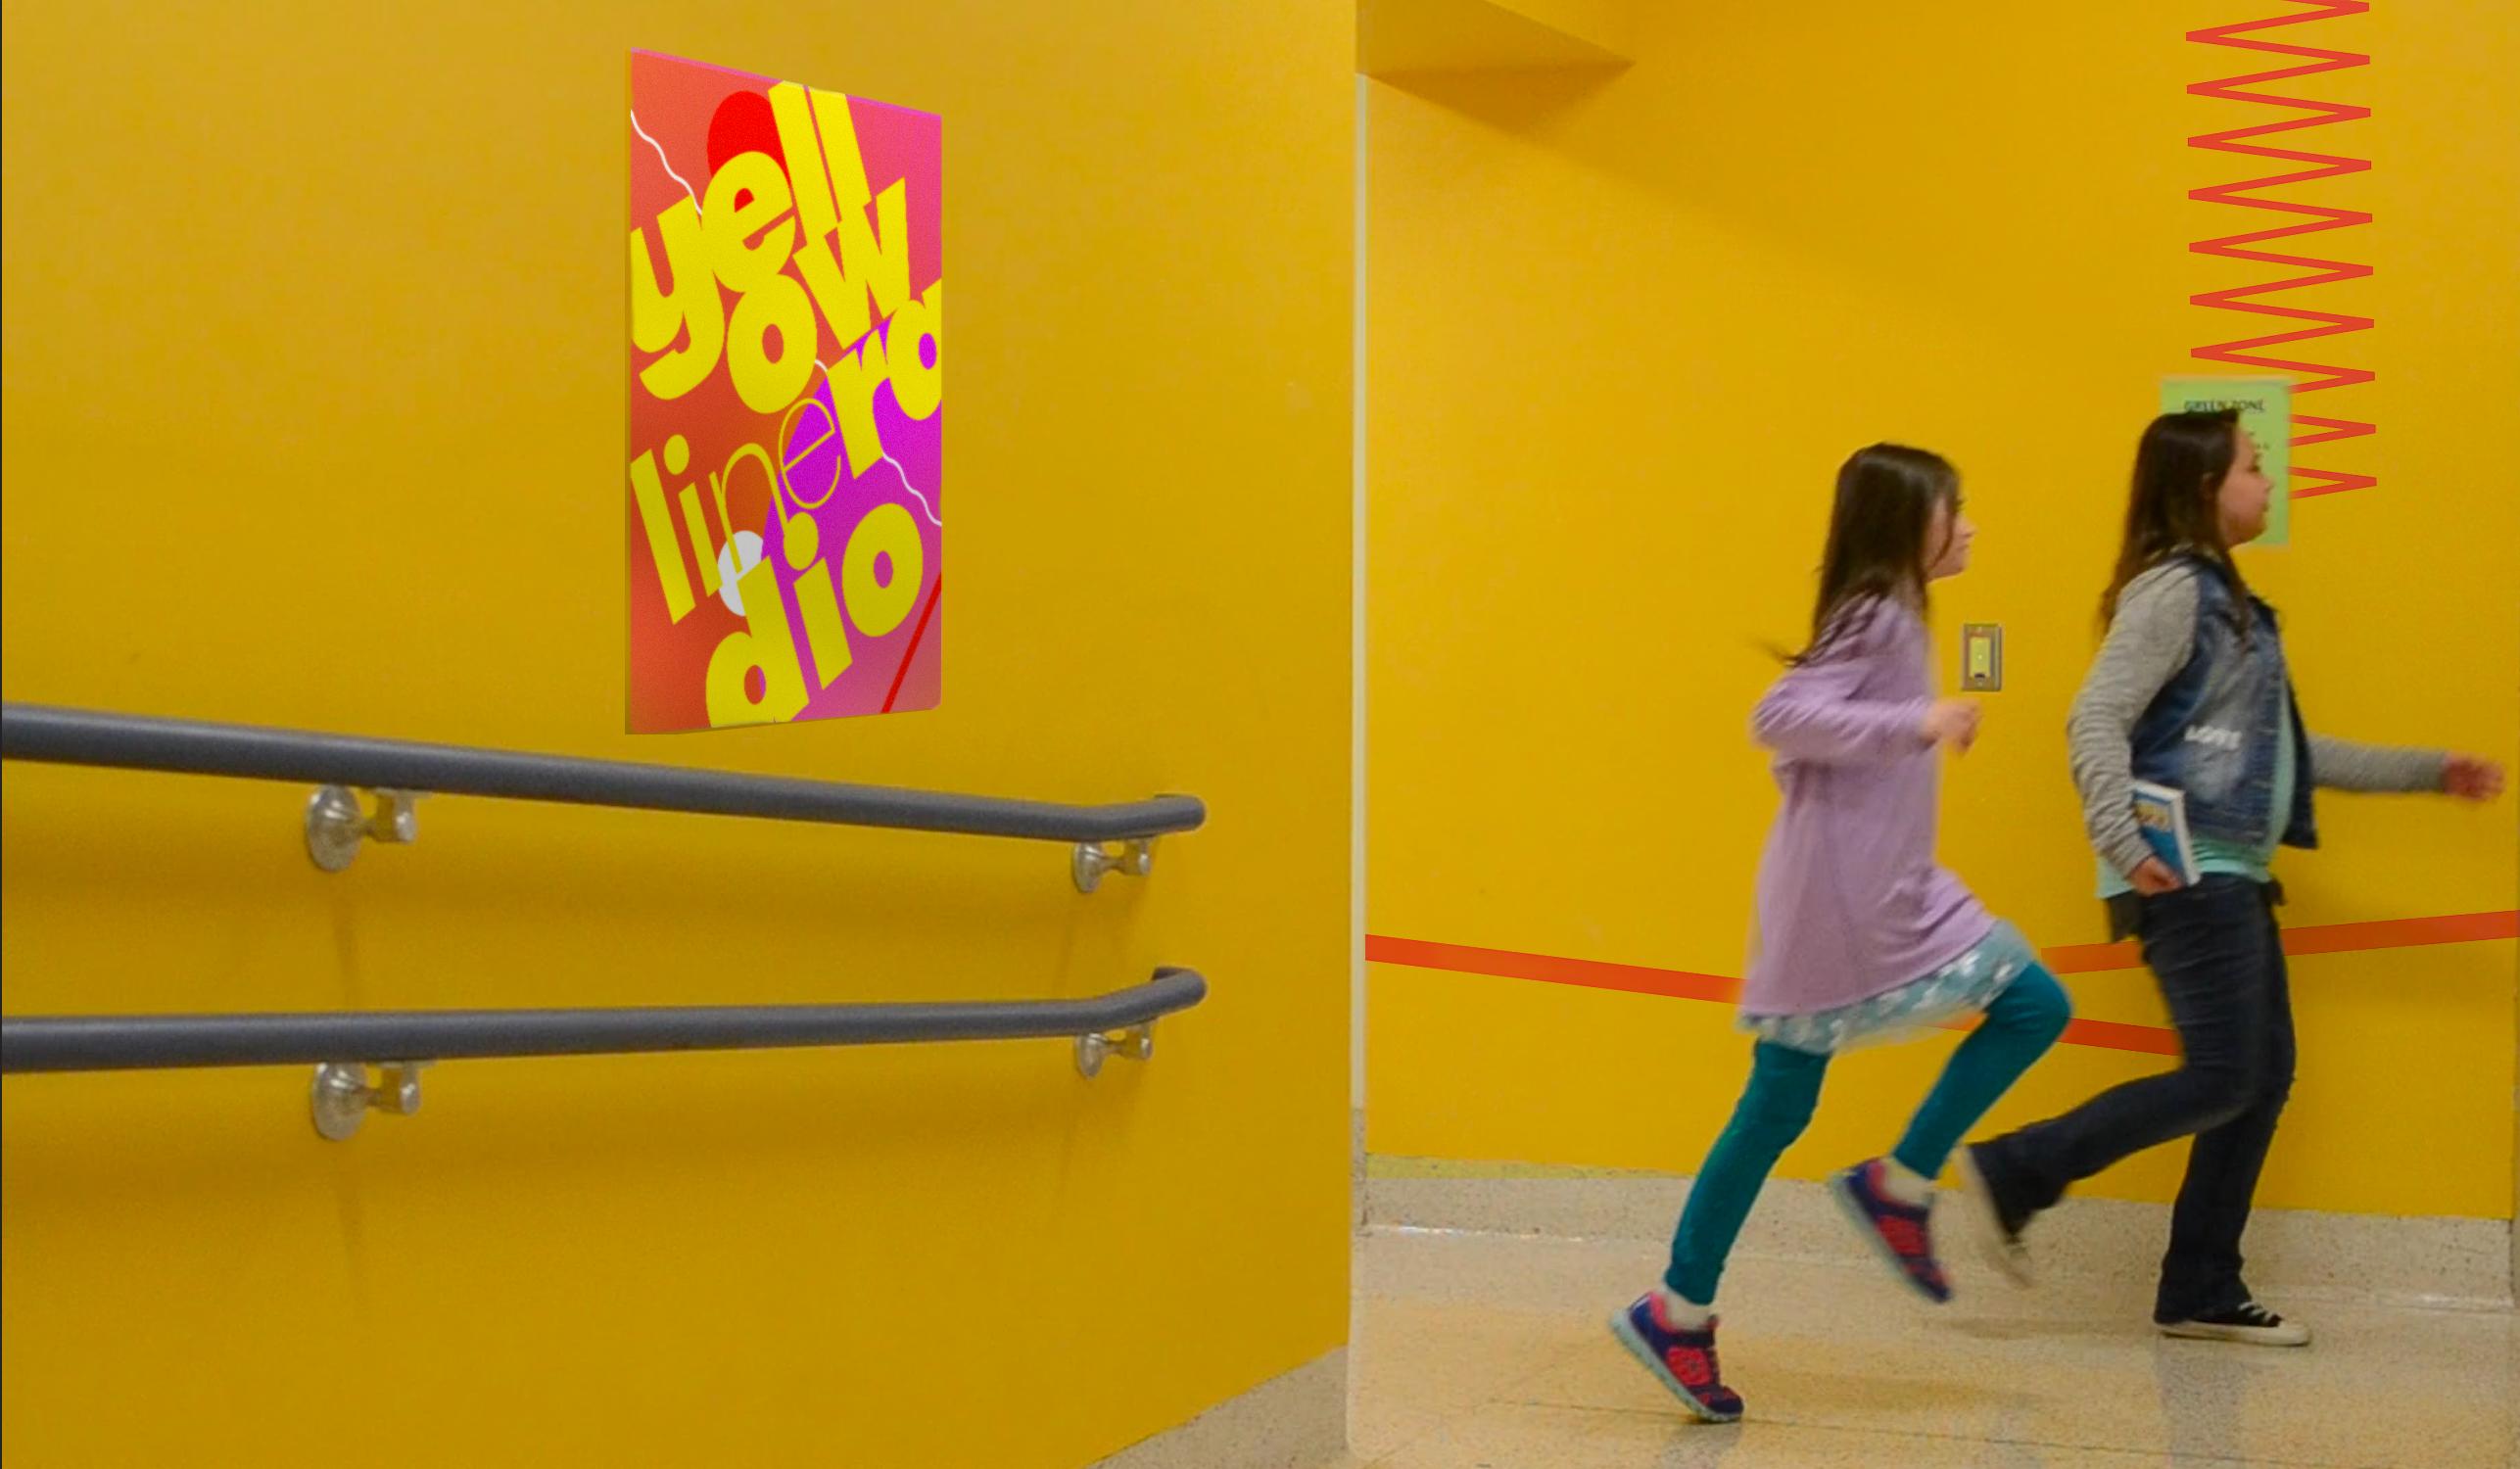 yellow-bus-photomontage-hall.png